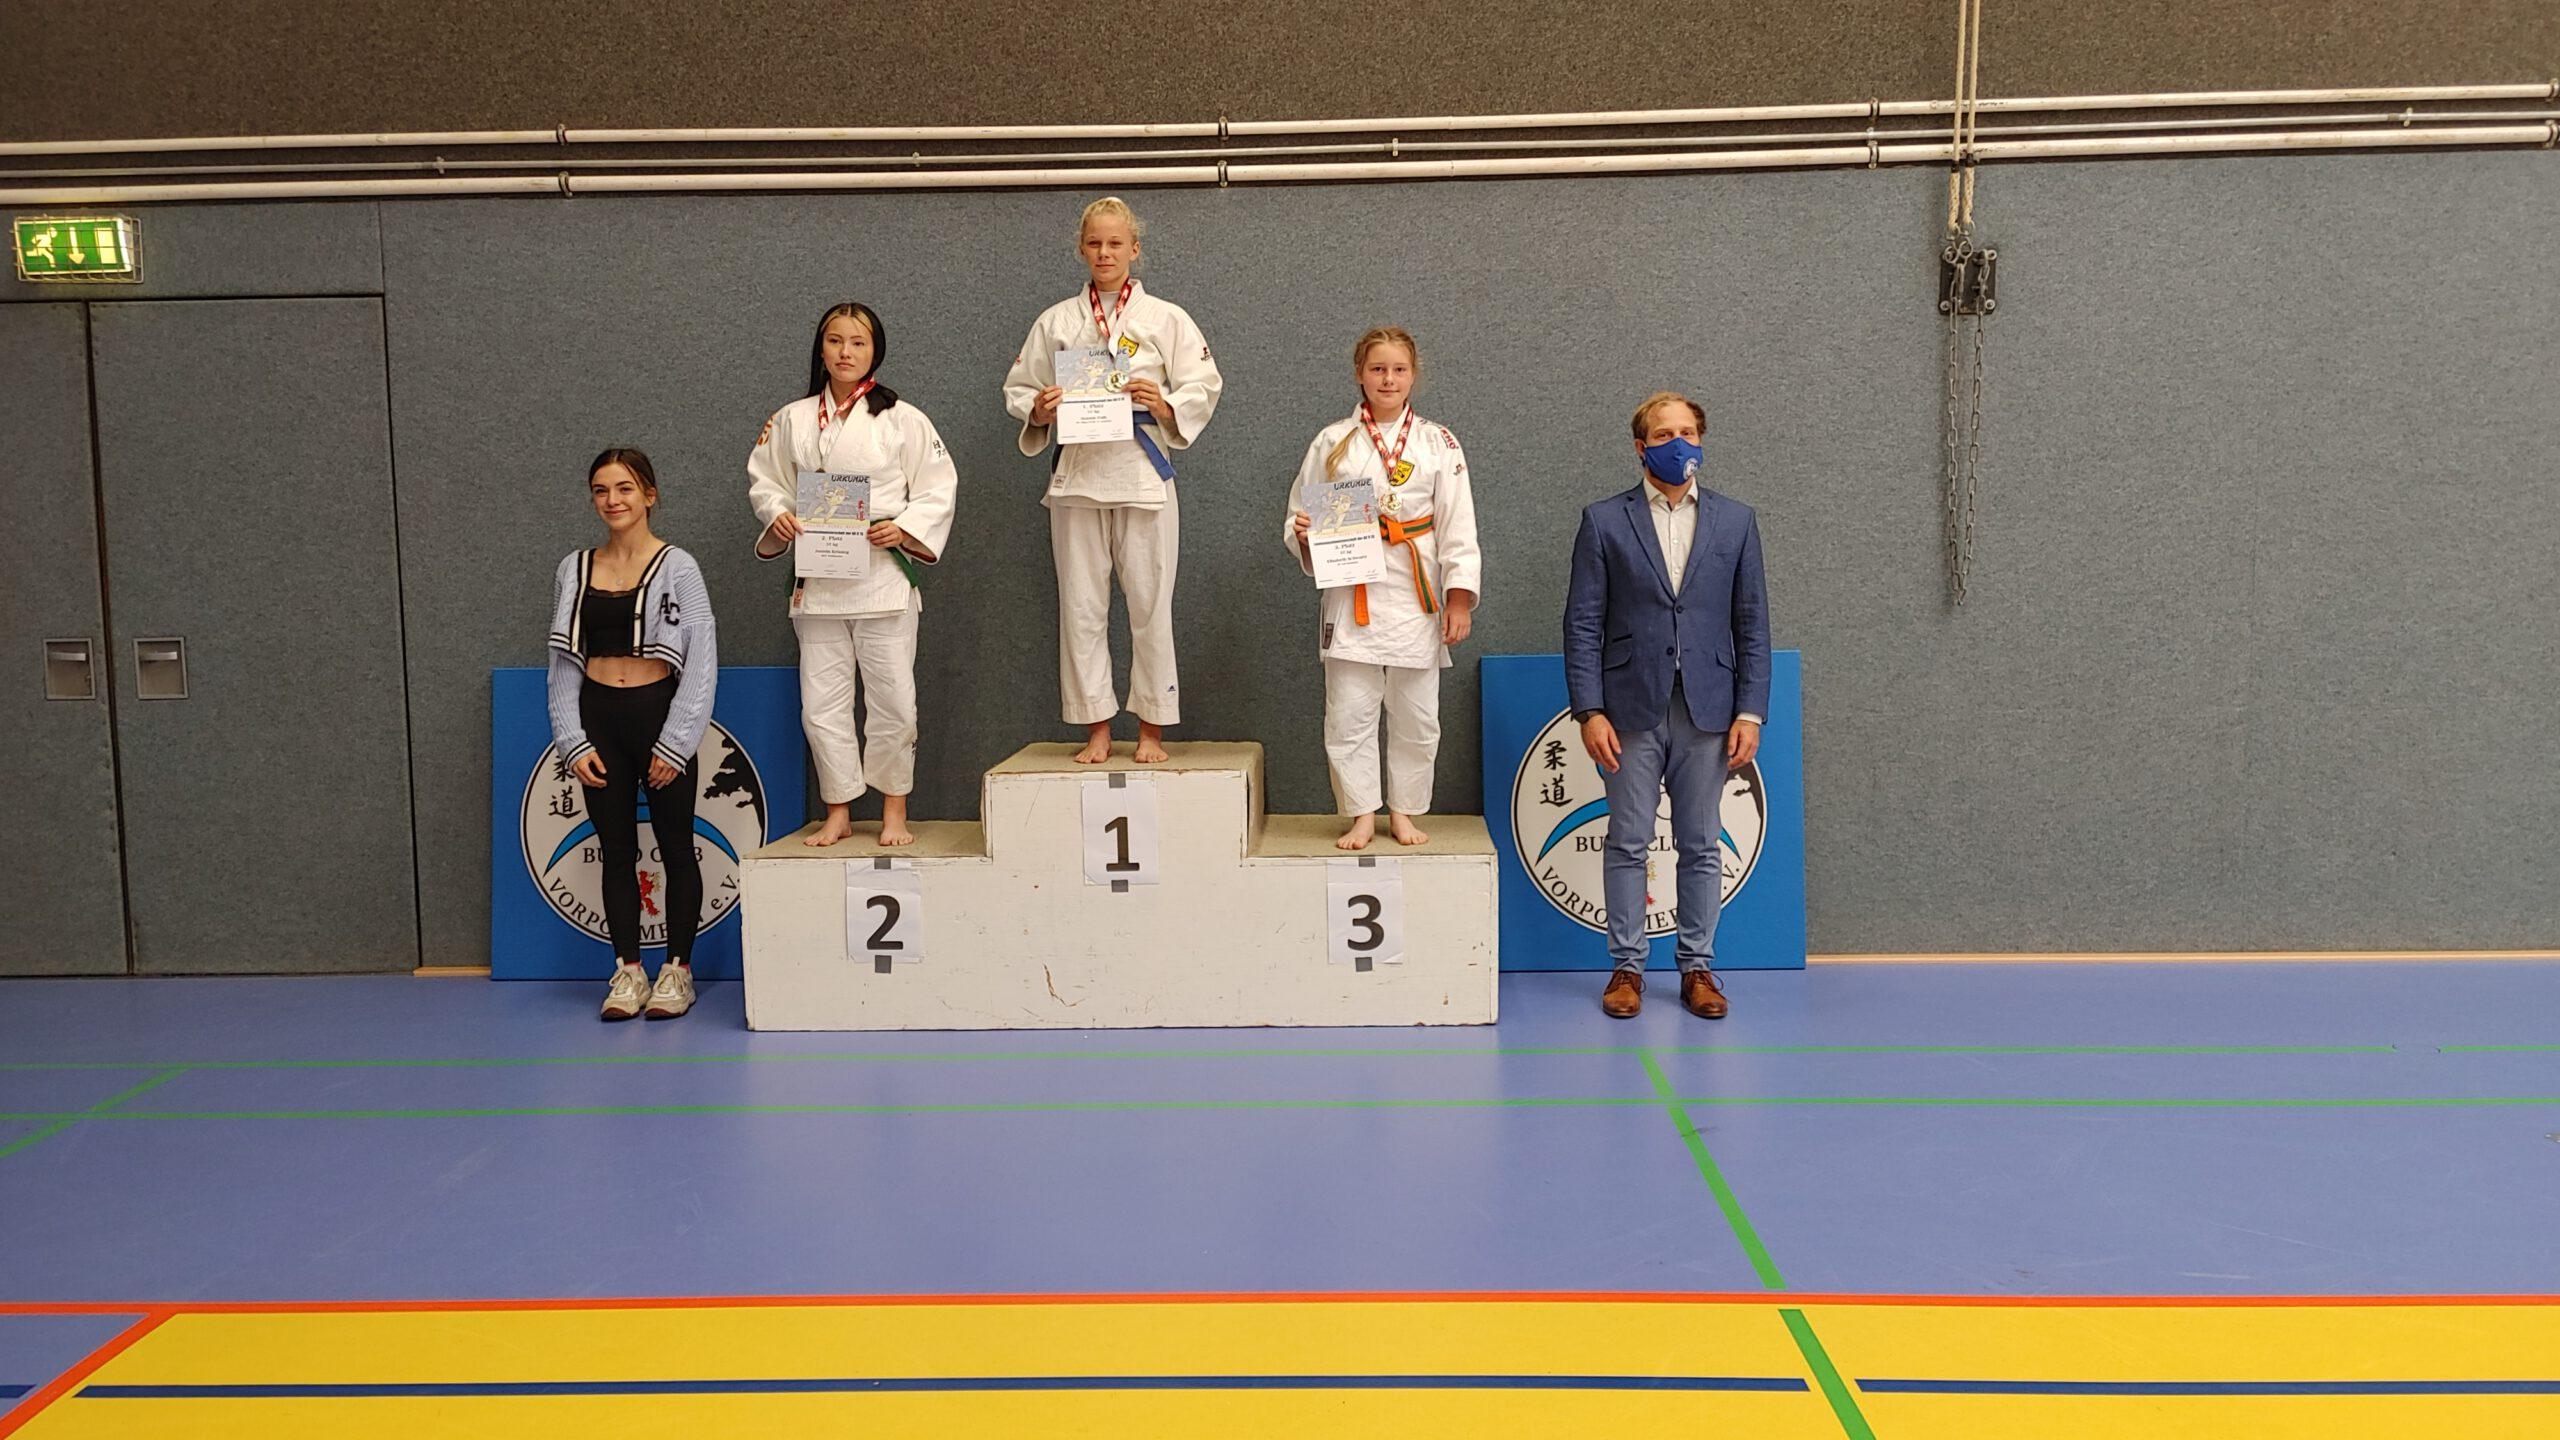 LEM U15 Greifswald 2021 Siegerehrung 2 Elli - Judo Rostock